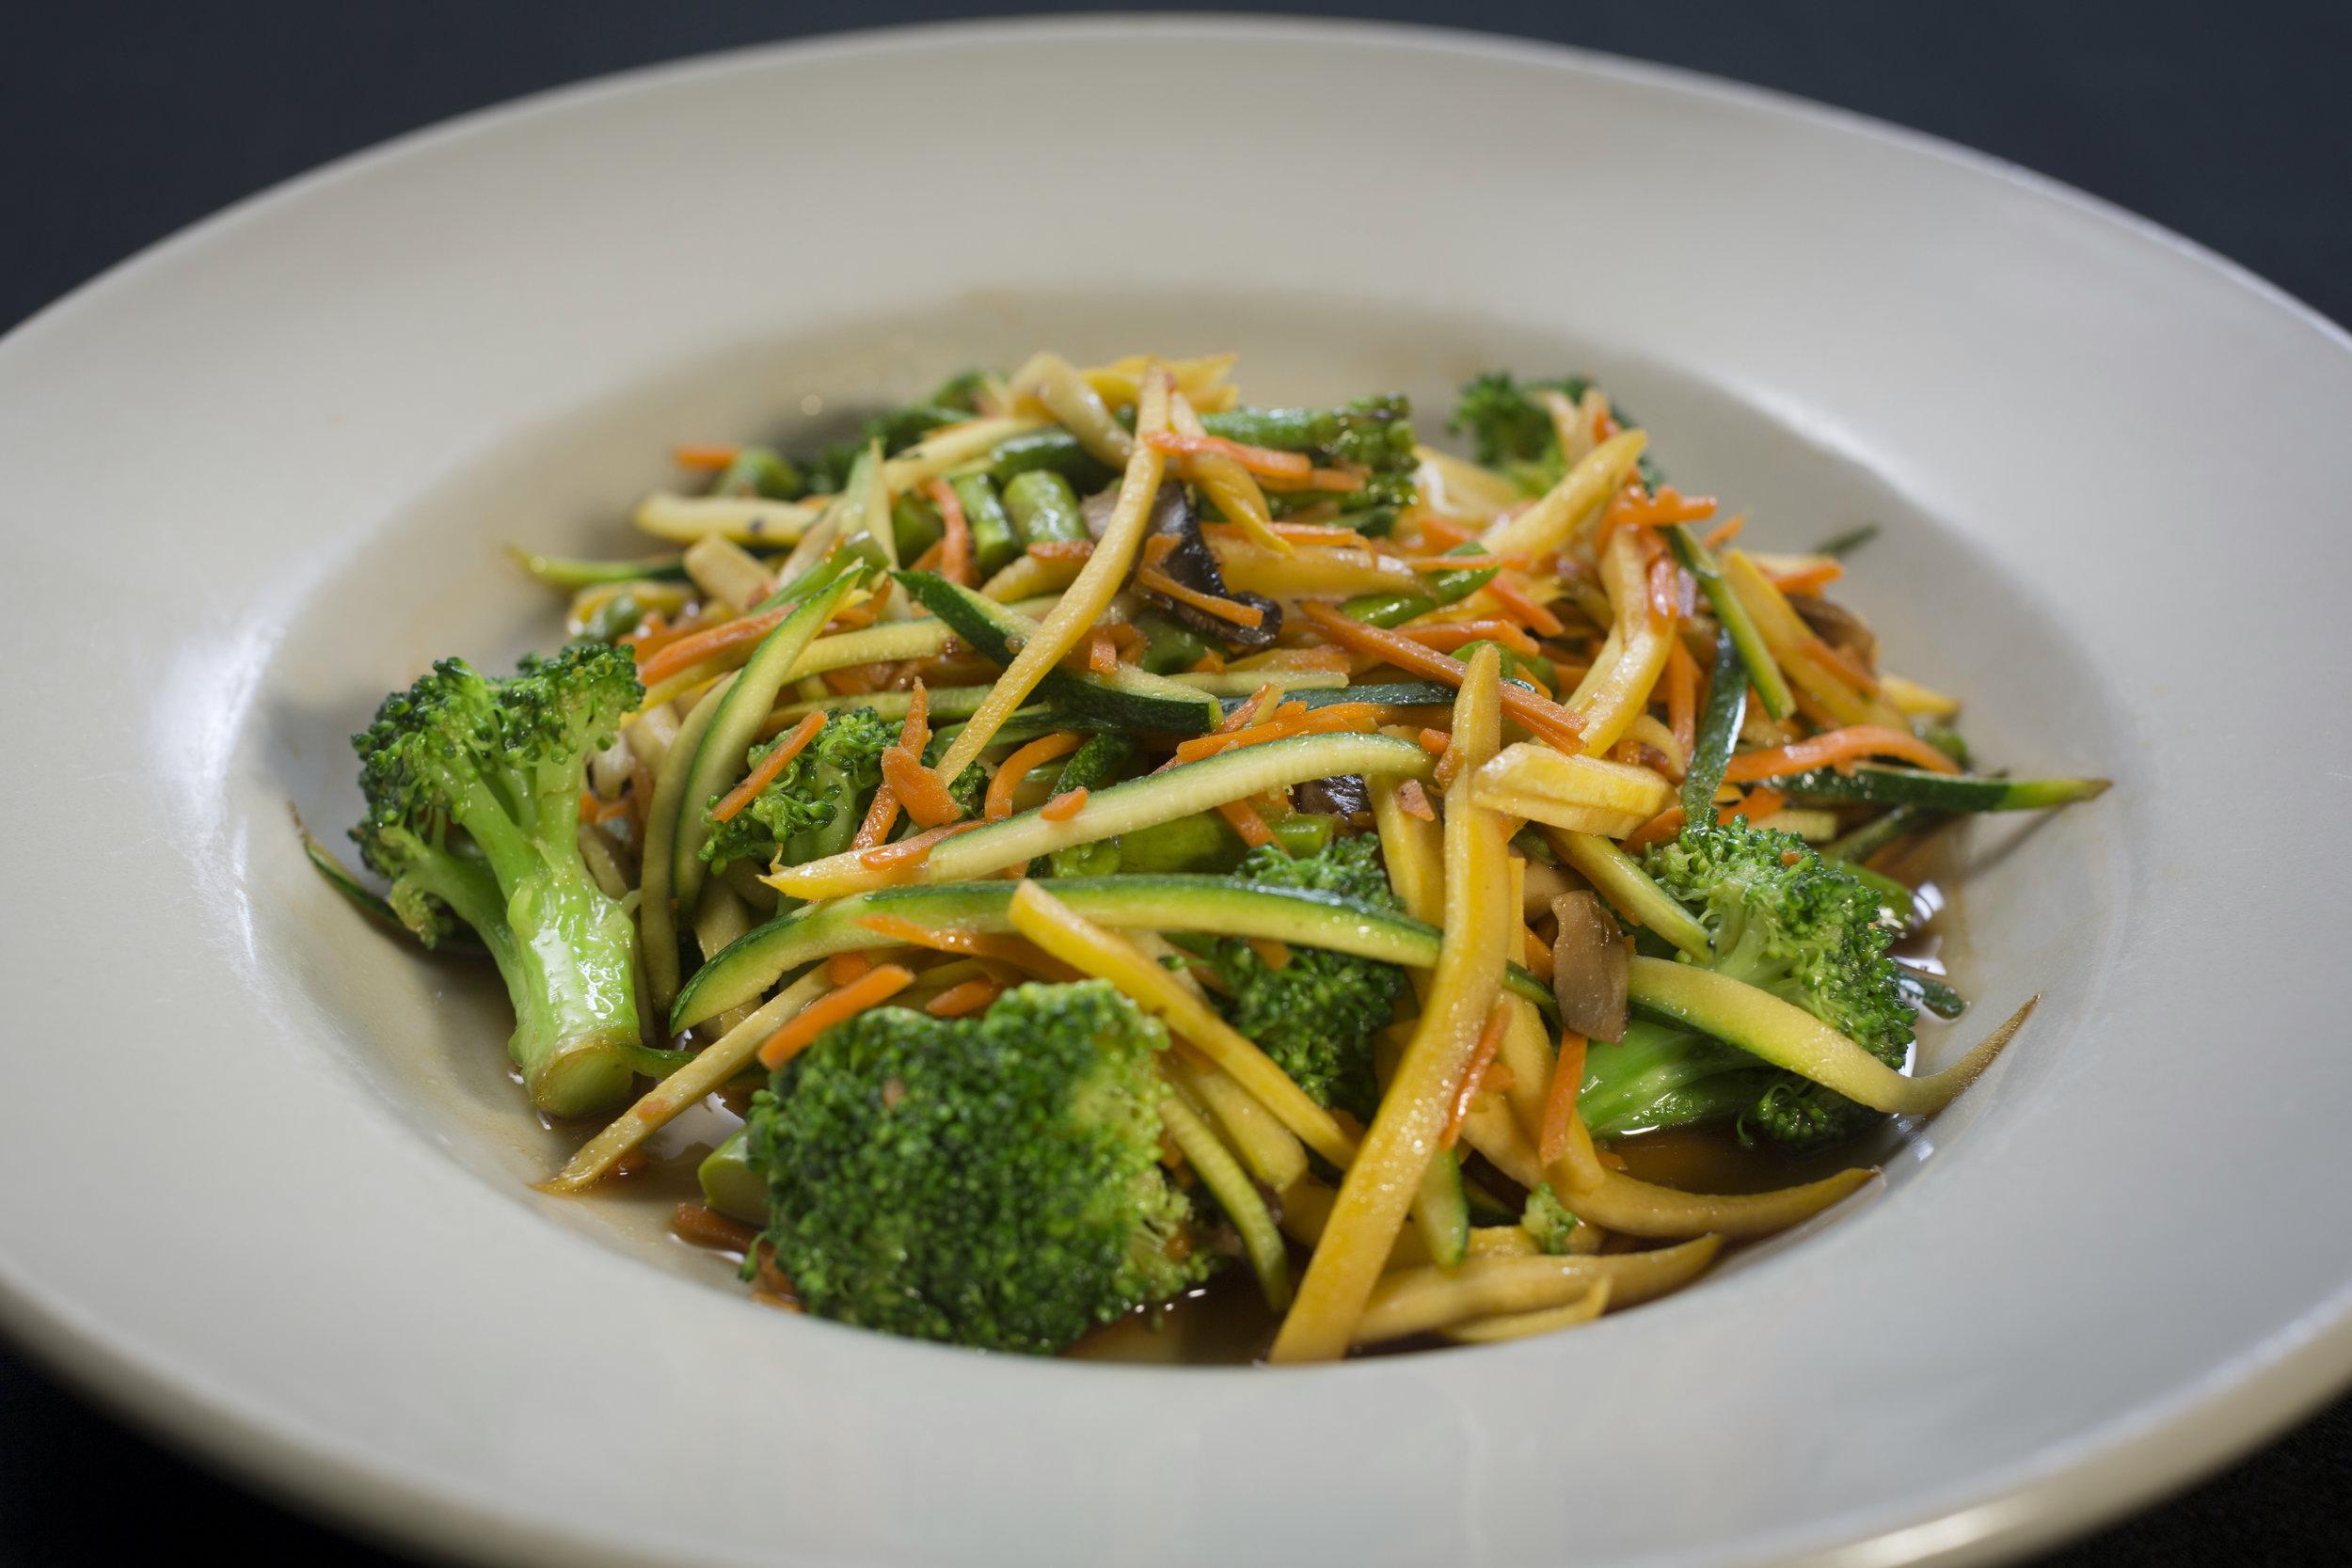 Plated bright veggie food item